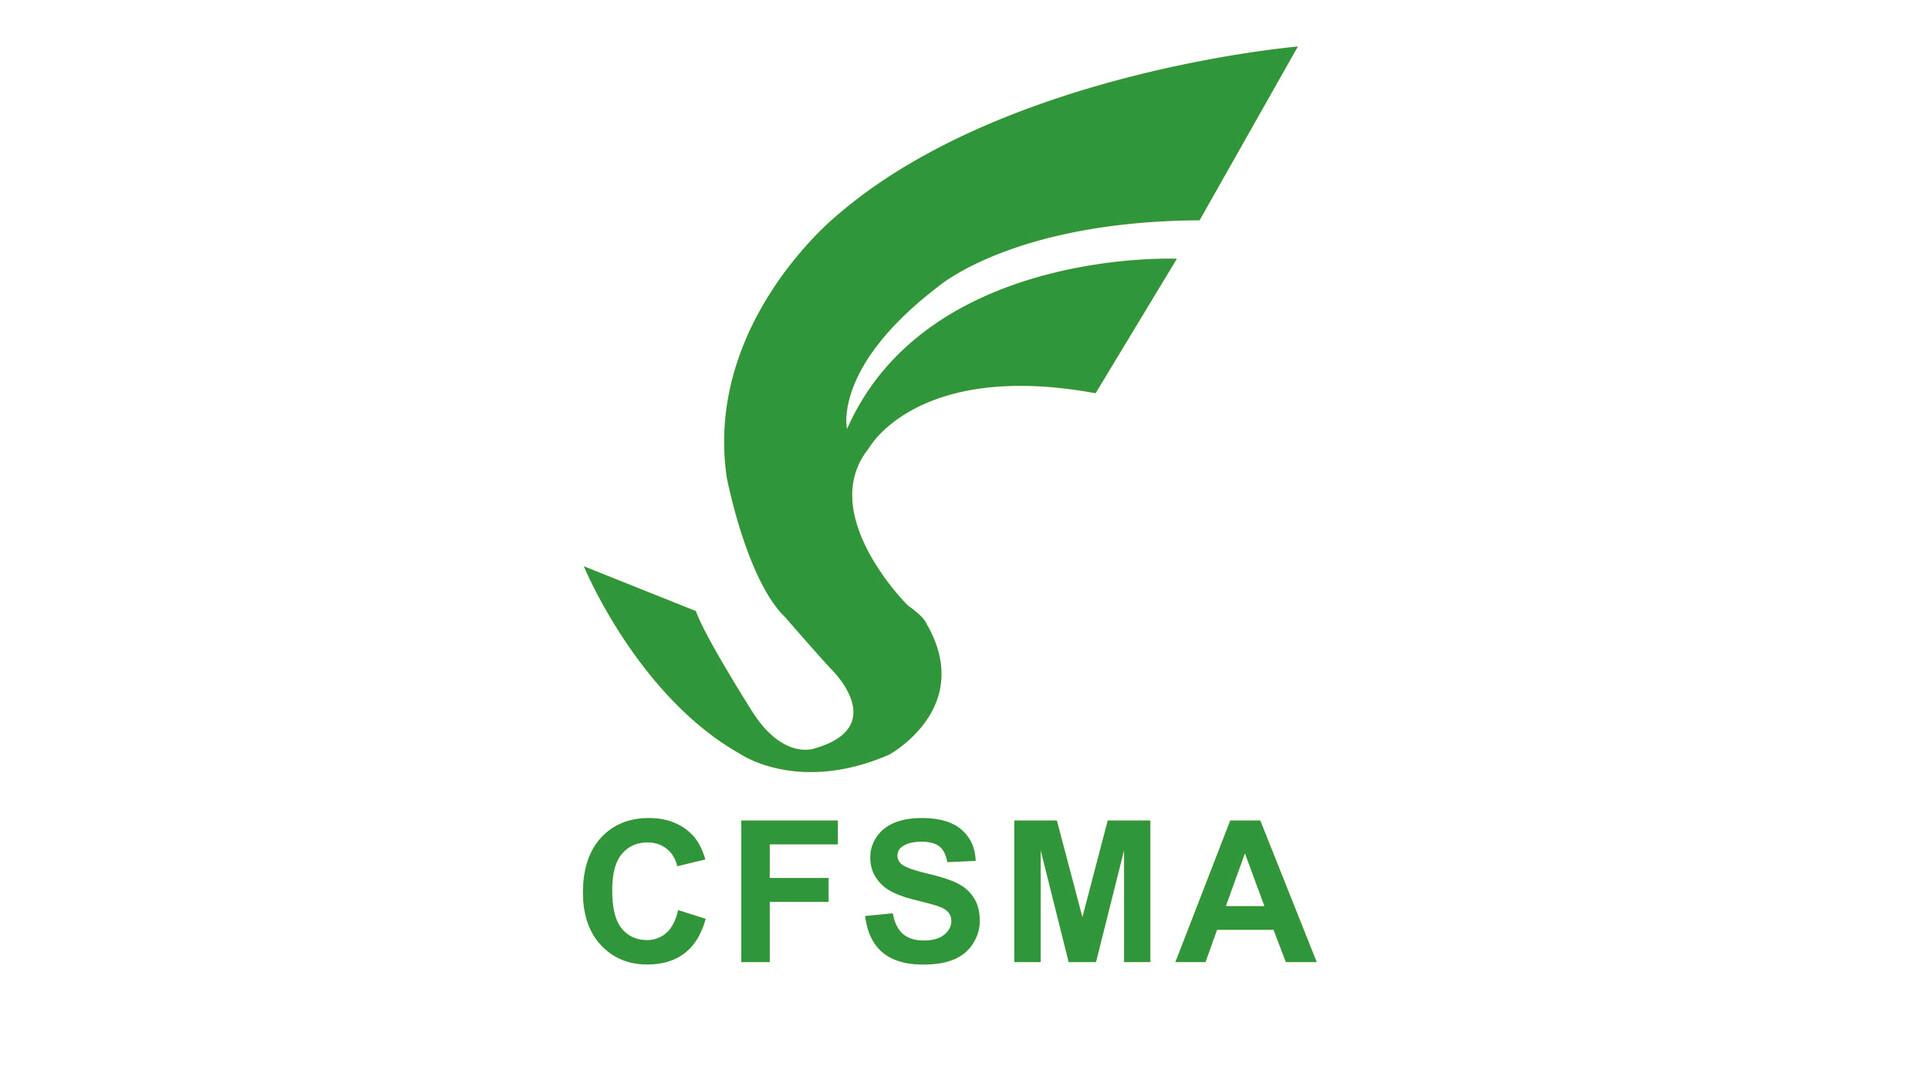 CFSMA Logo, Events